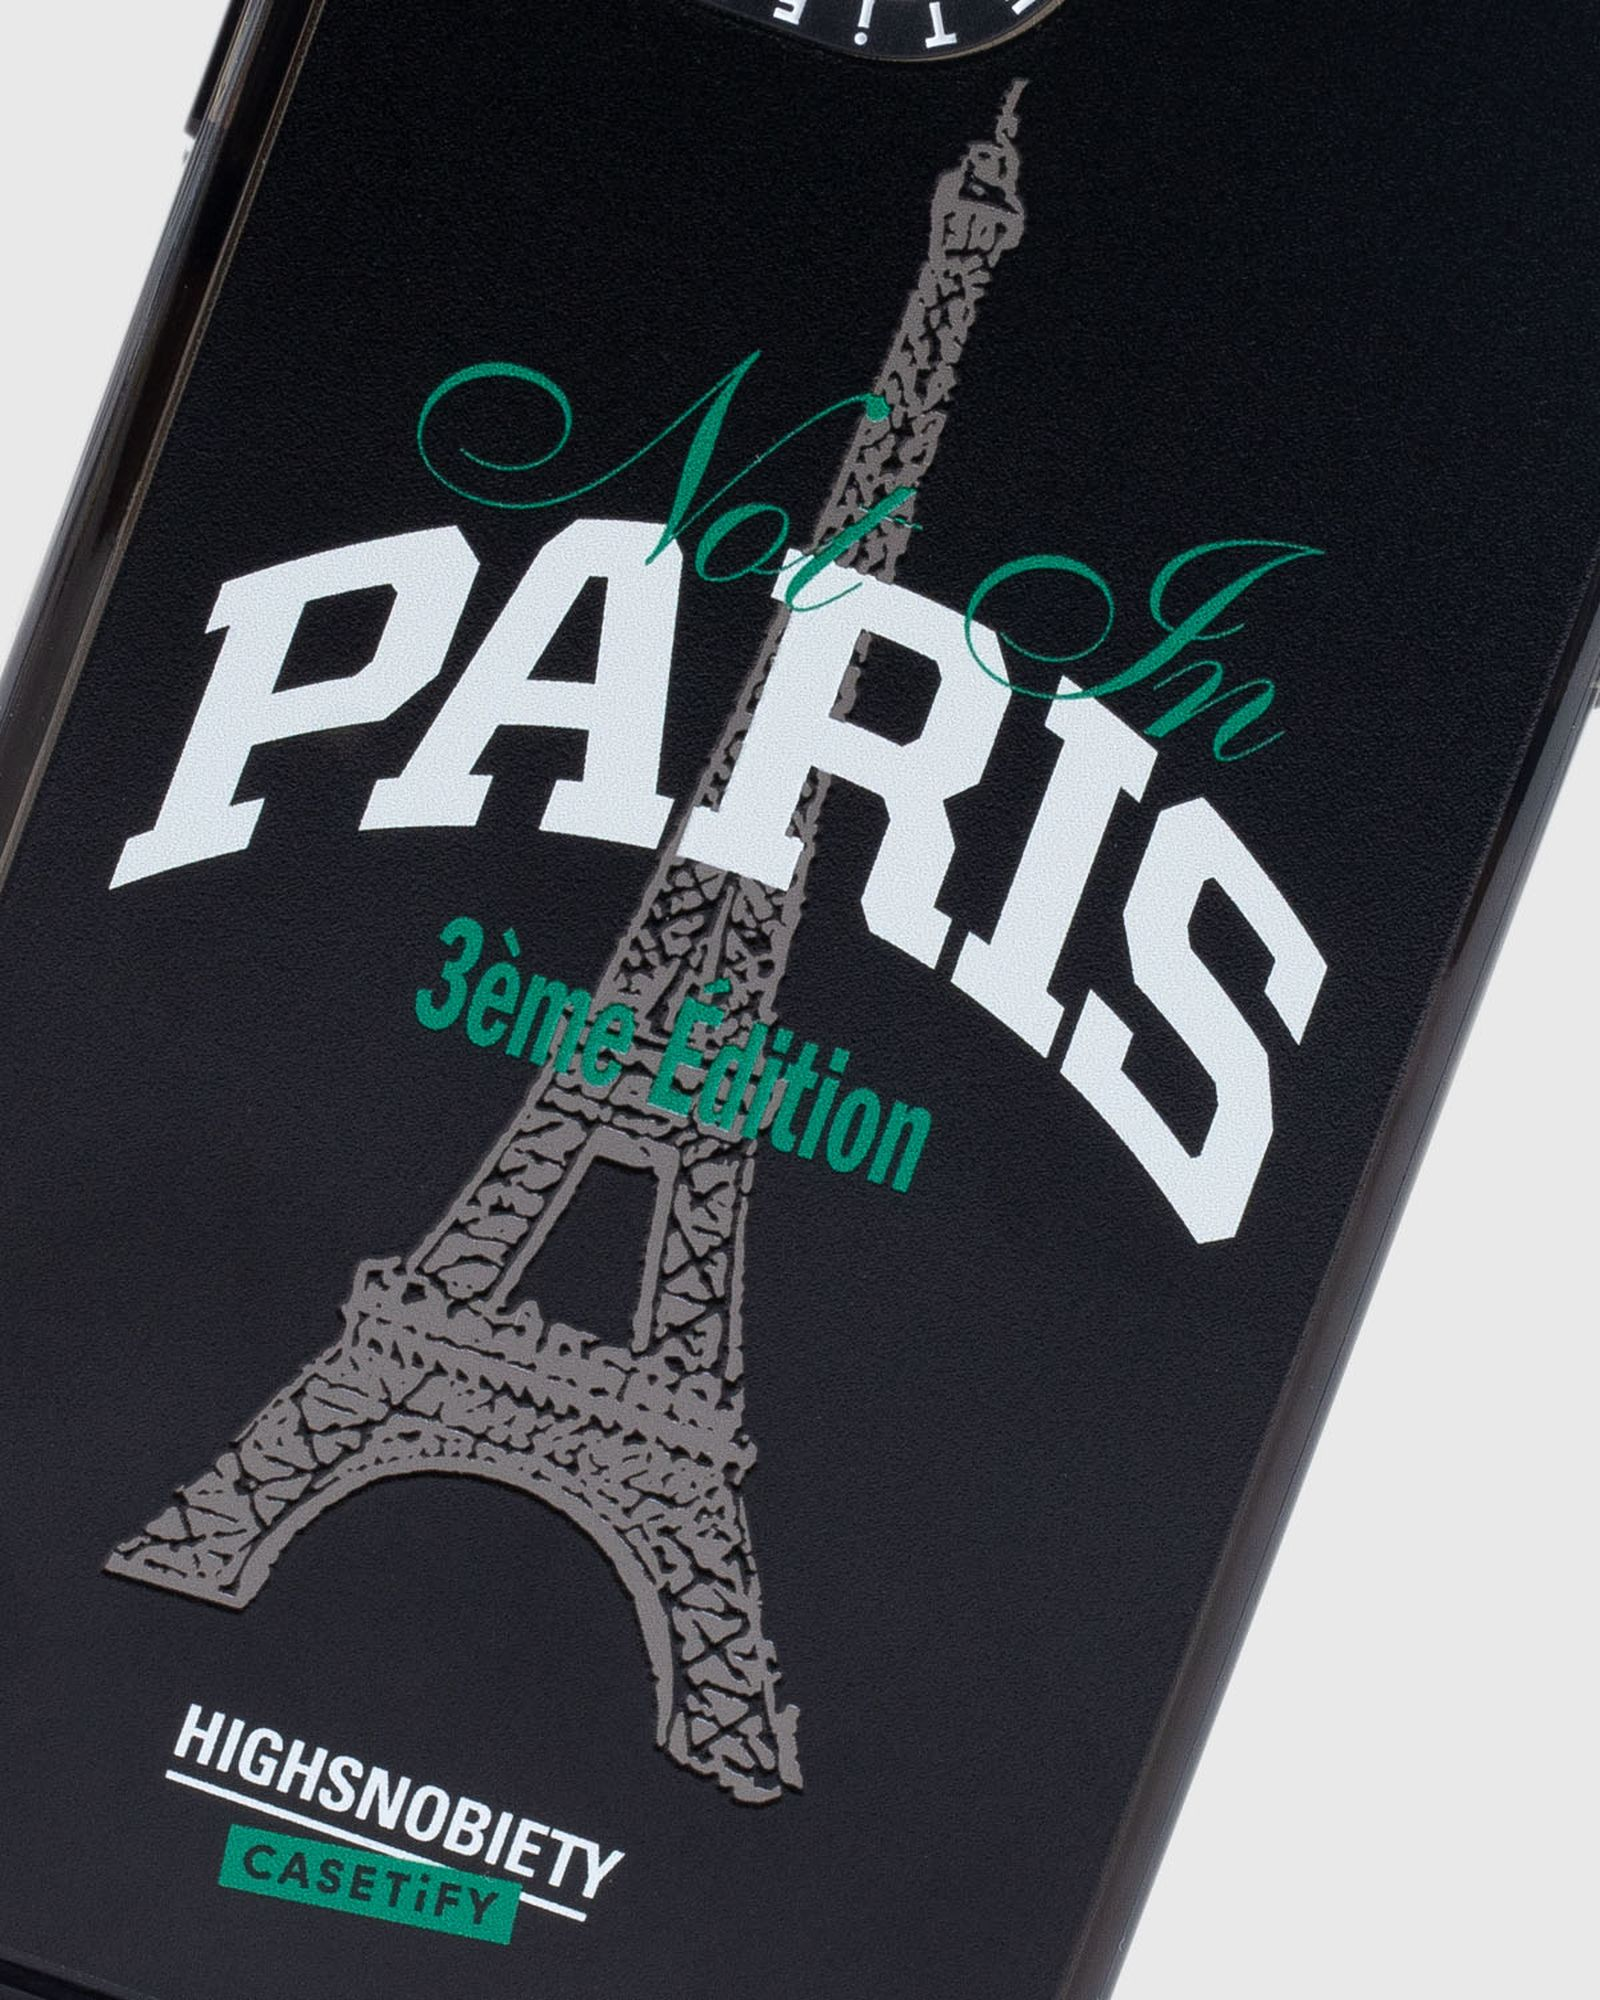 not-in-paris-releases-casetify-02